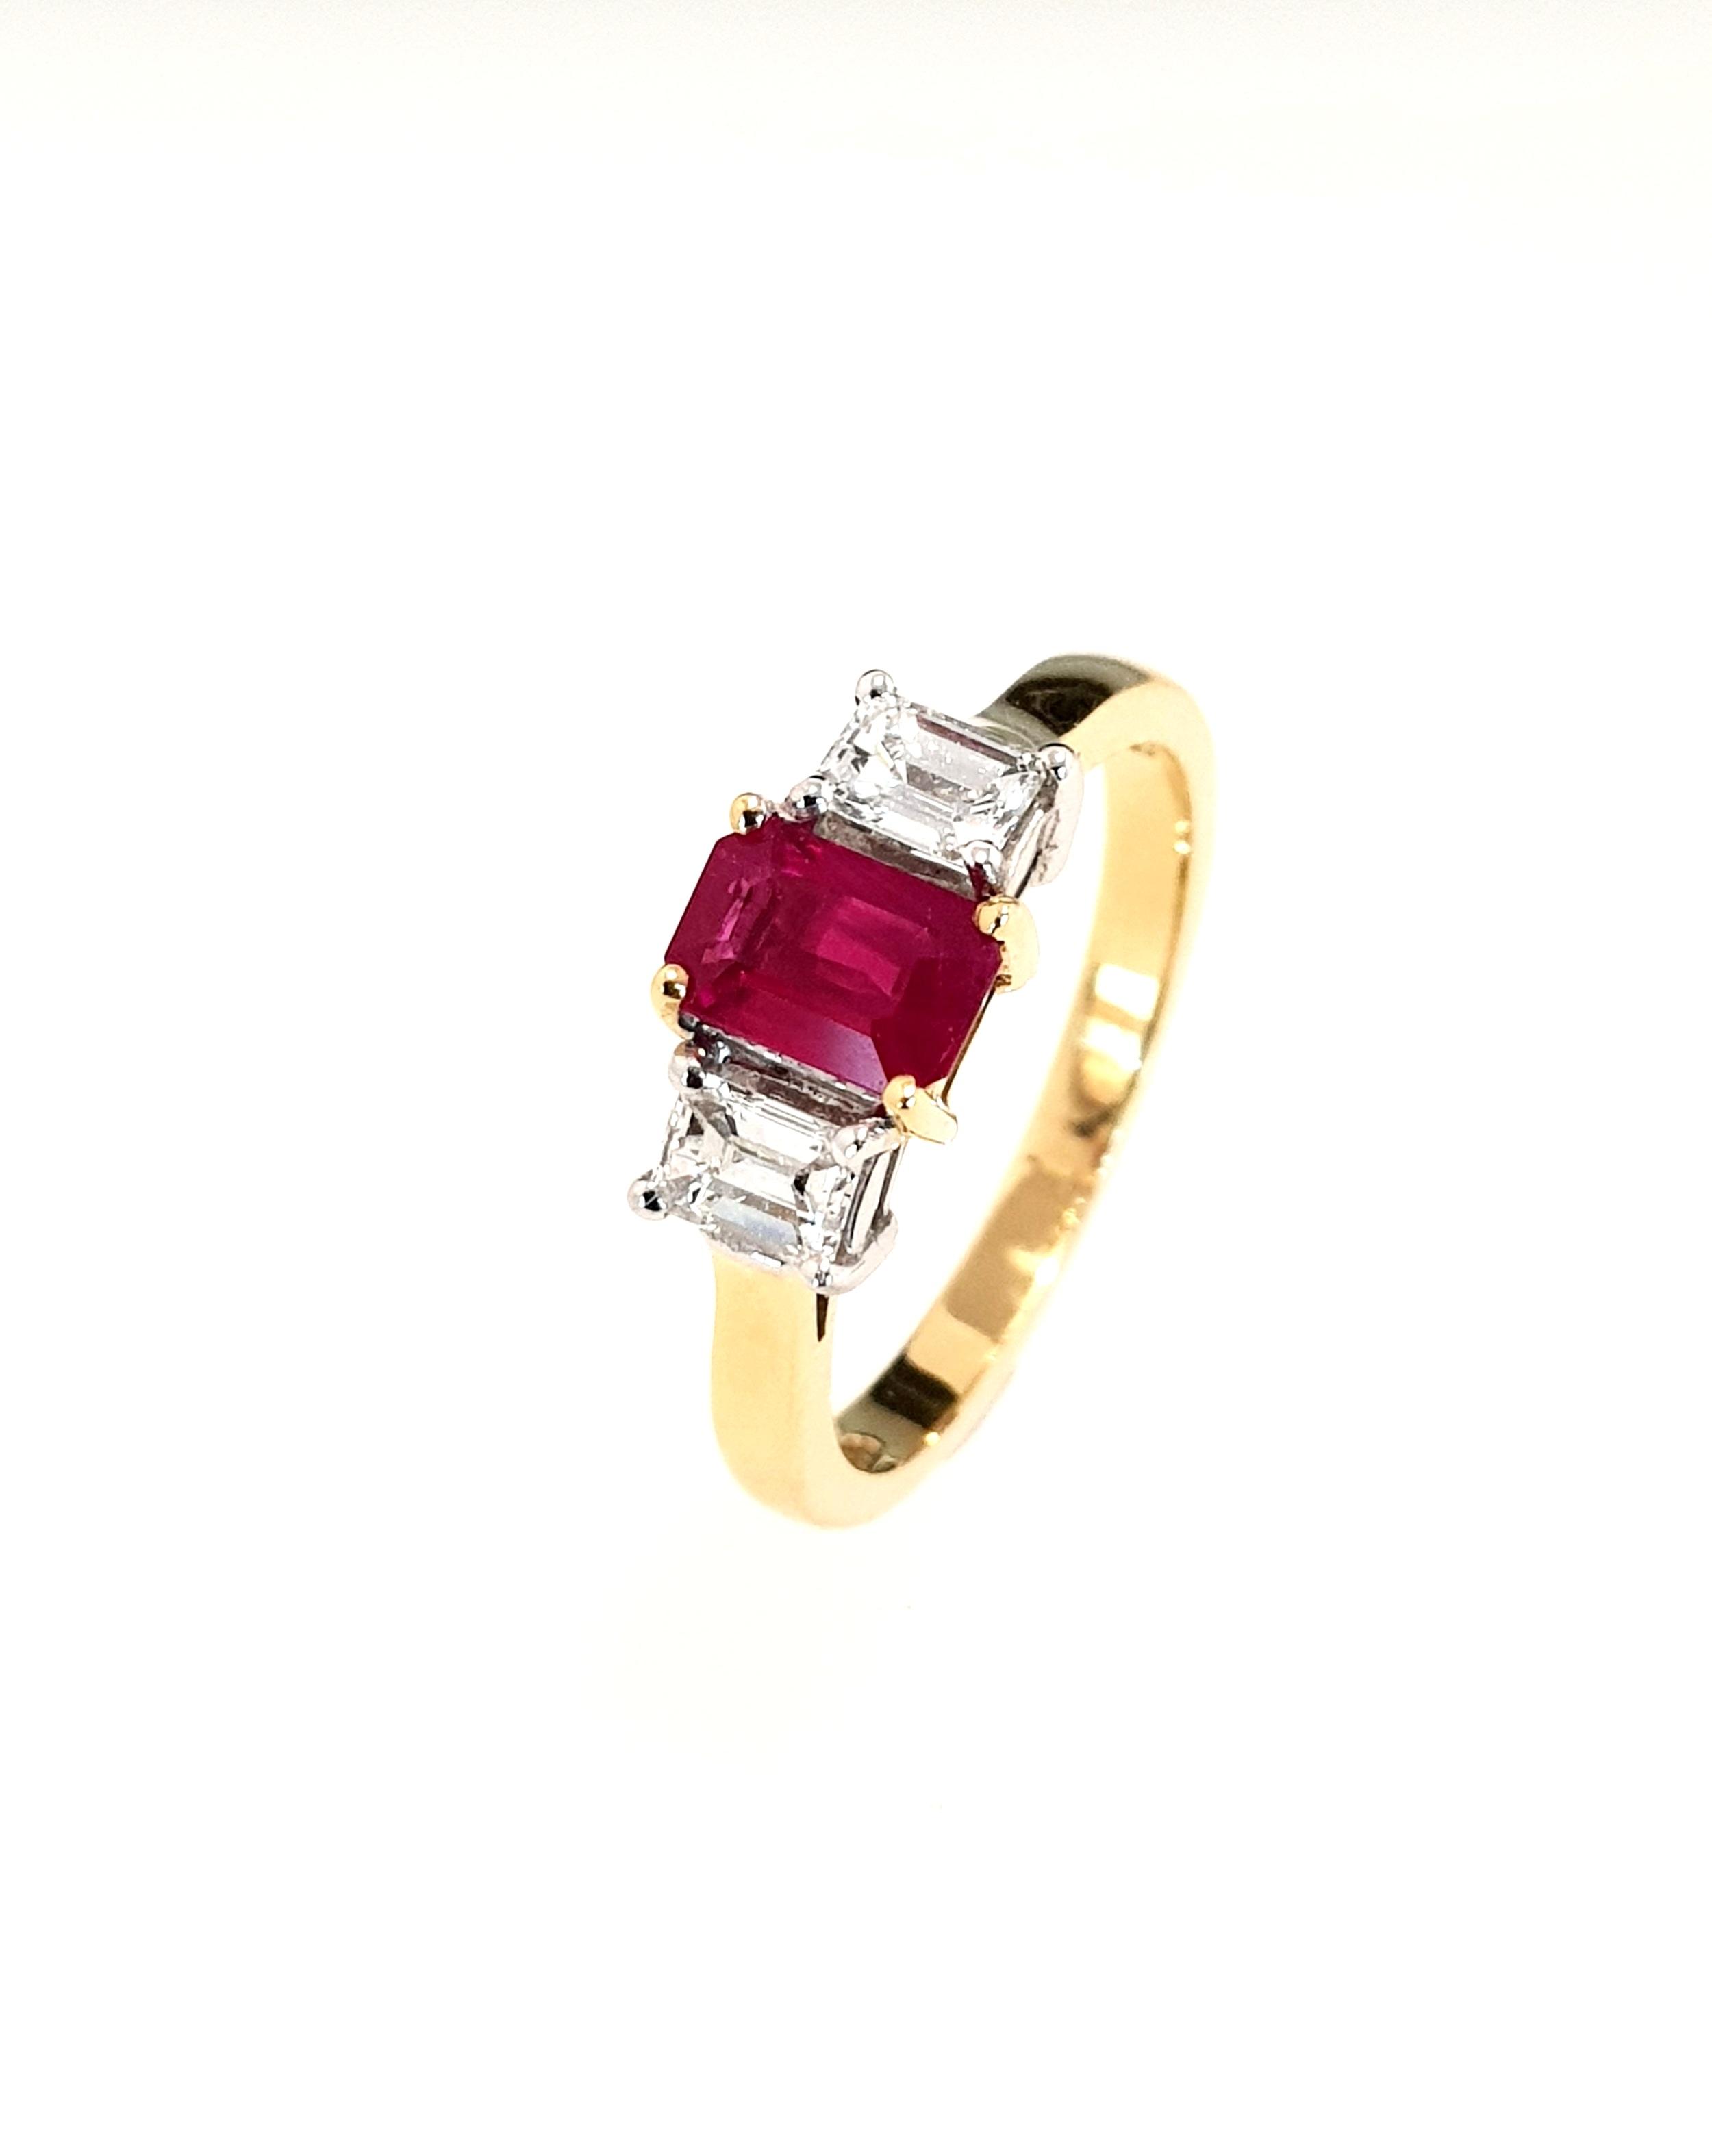 18ct Yellow Gold Ruby (.50ct) & Diamond Ring  Diamond: .40ct, G, Si1  Stock Code: N8511  £2100